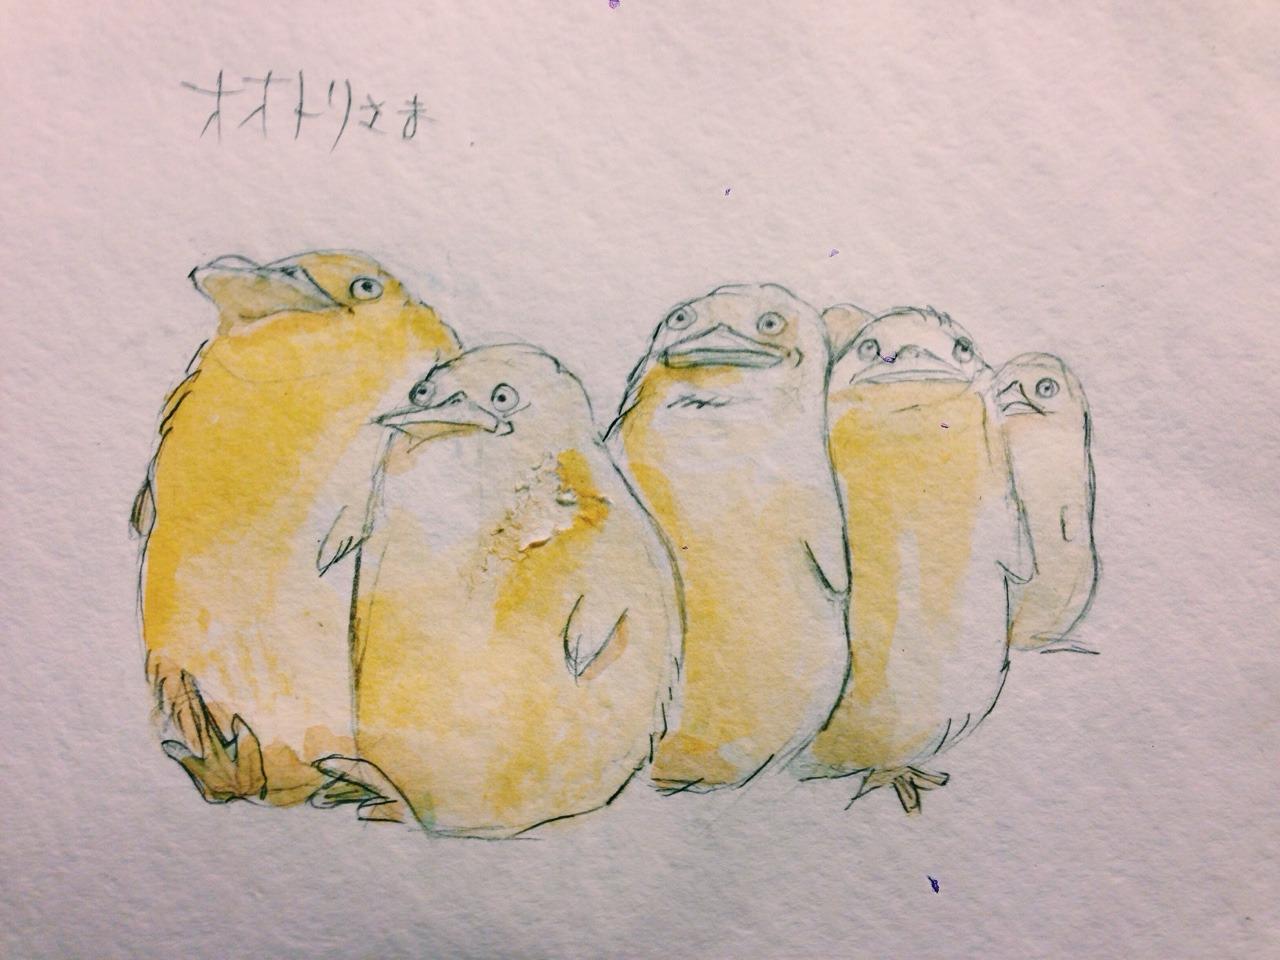 Silence Spirited Away Ducks Concept Art Done Again In